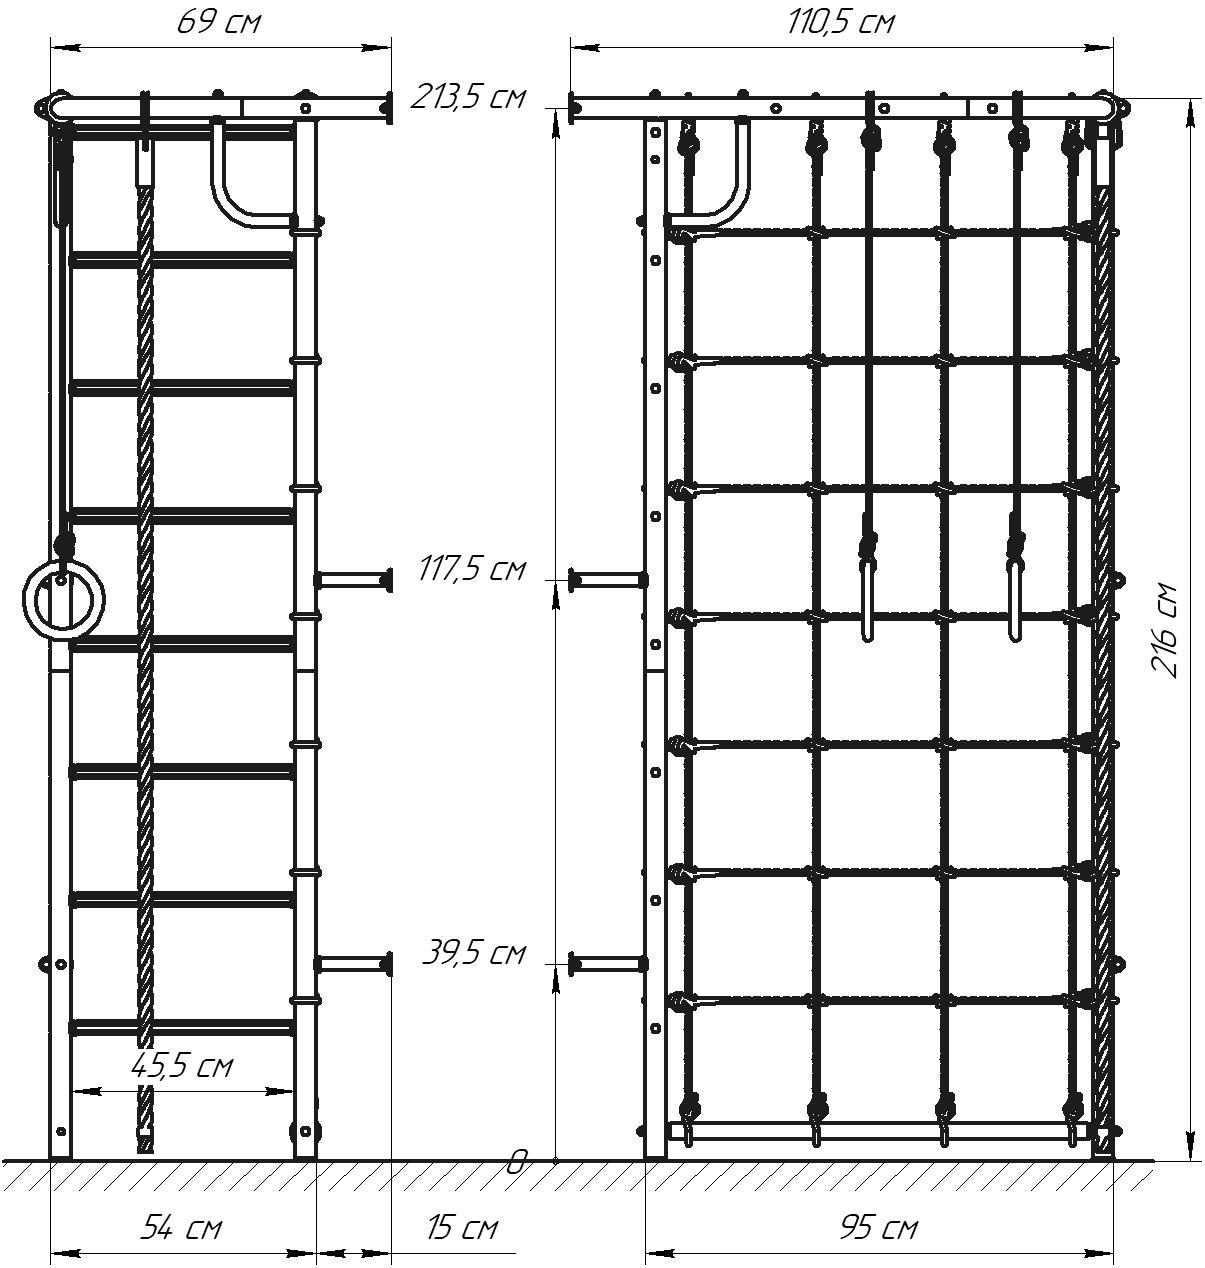 ДСК Рукоход-Угловой схема